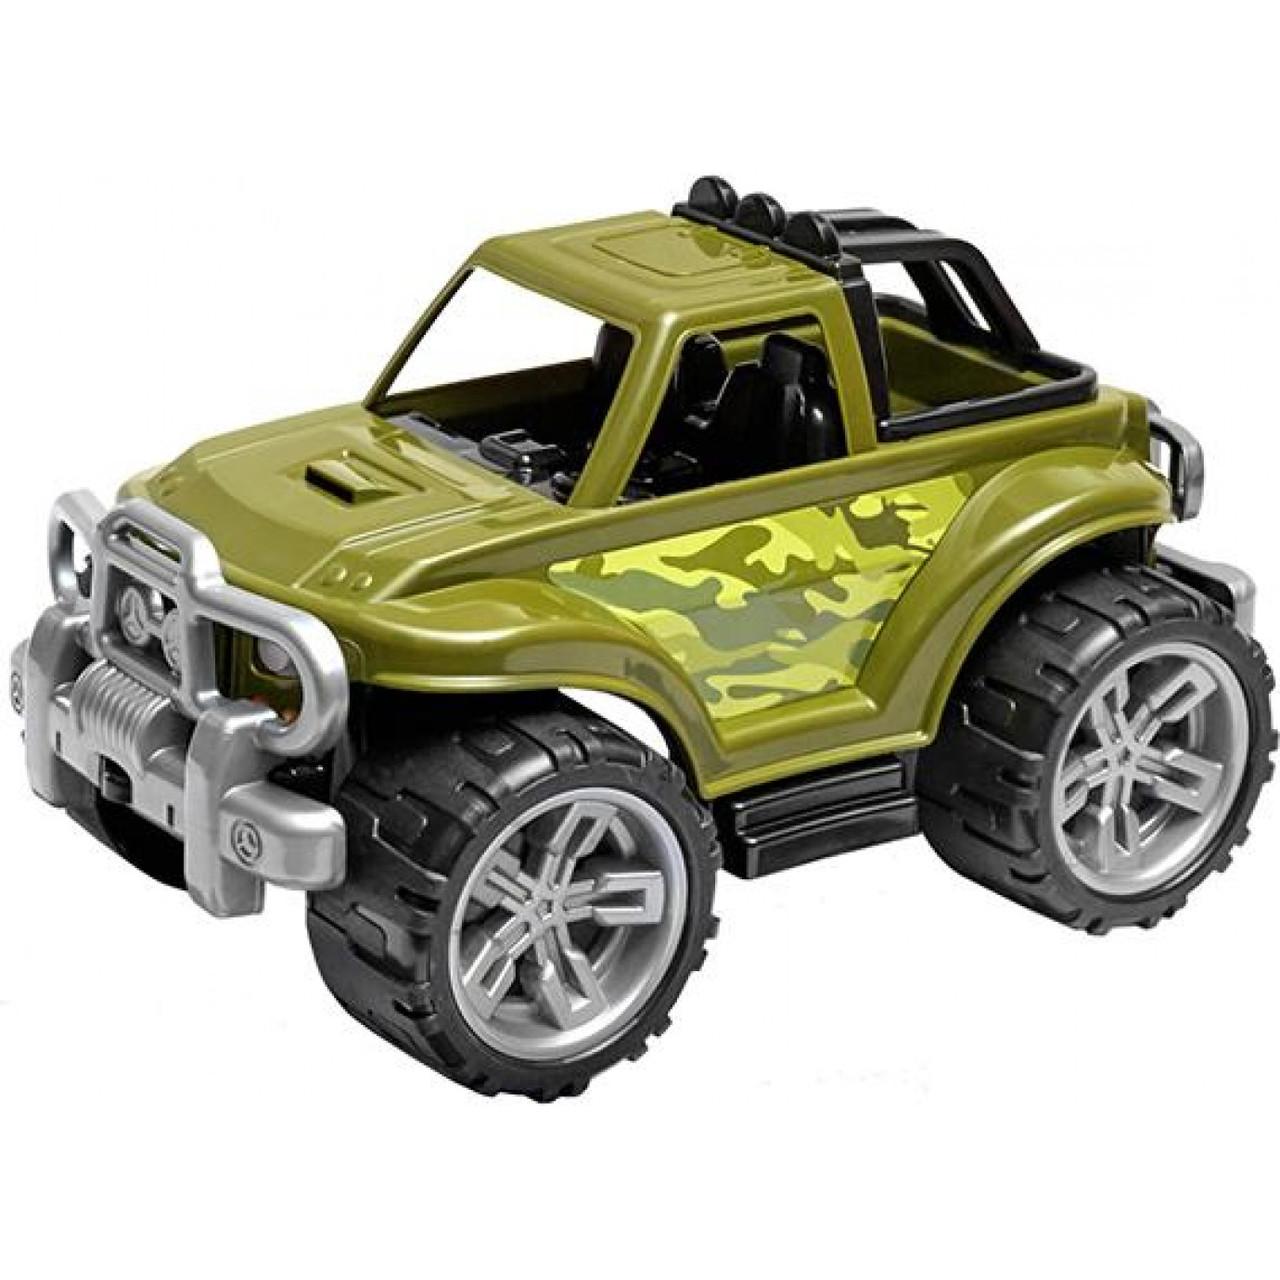 Позашляховик 3565 / Технокомп